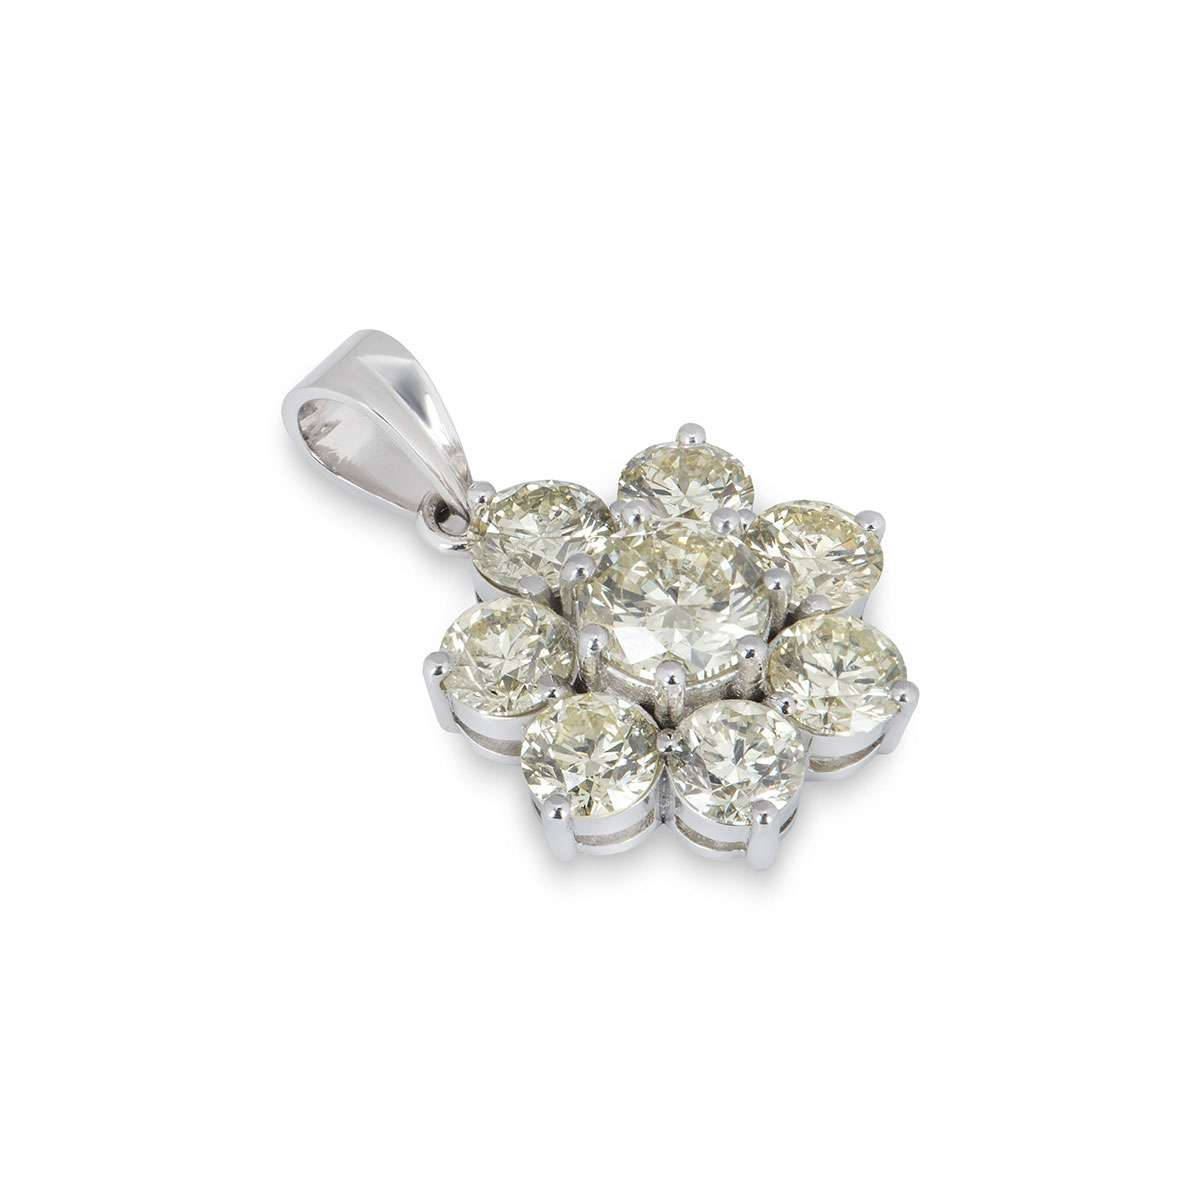 White Gold Diamond Flower Pendant 7.03ct TDW